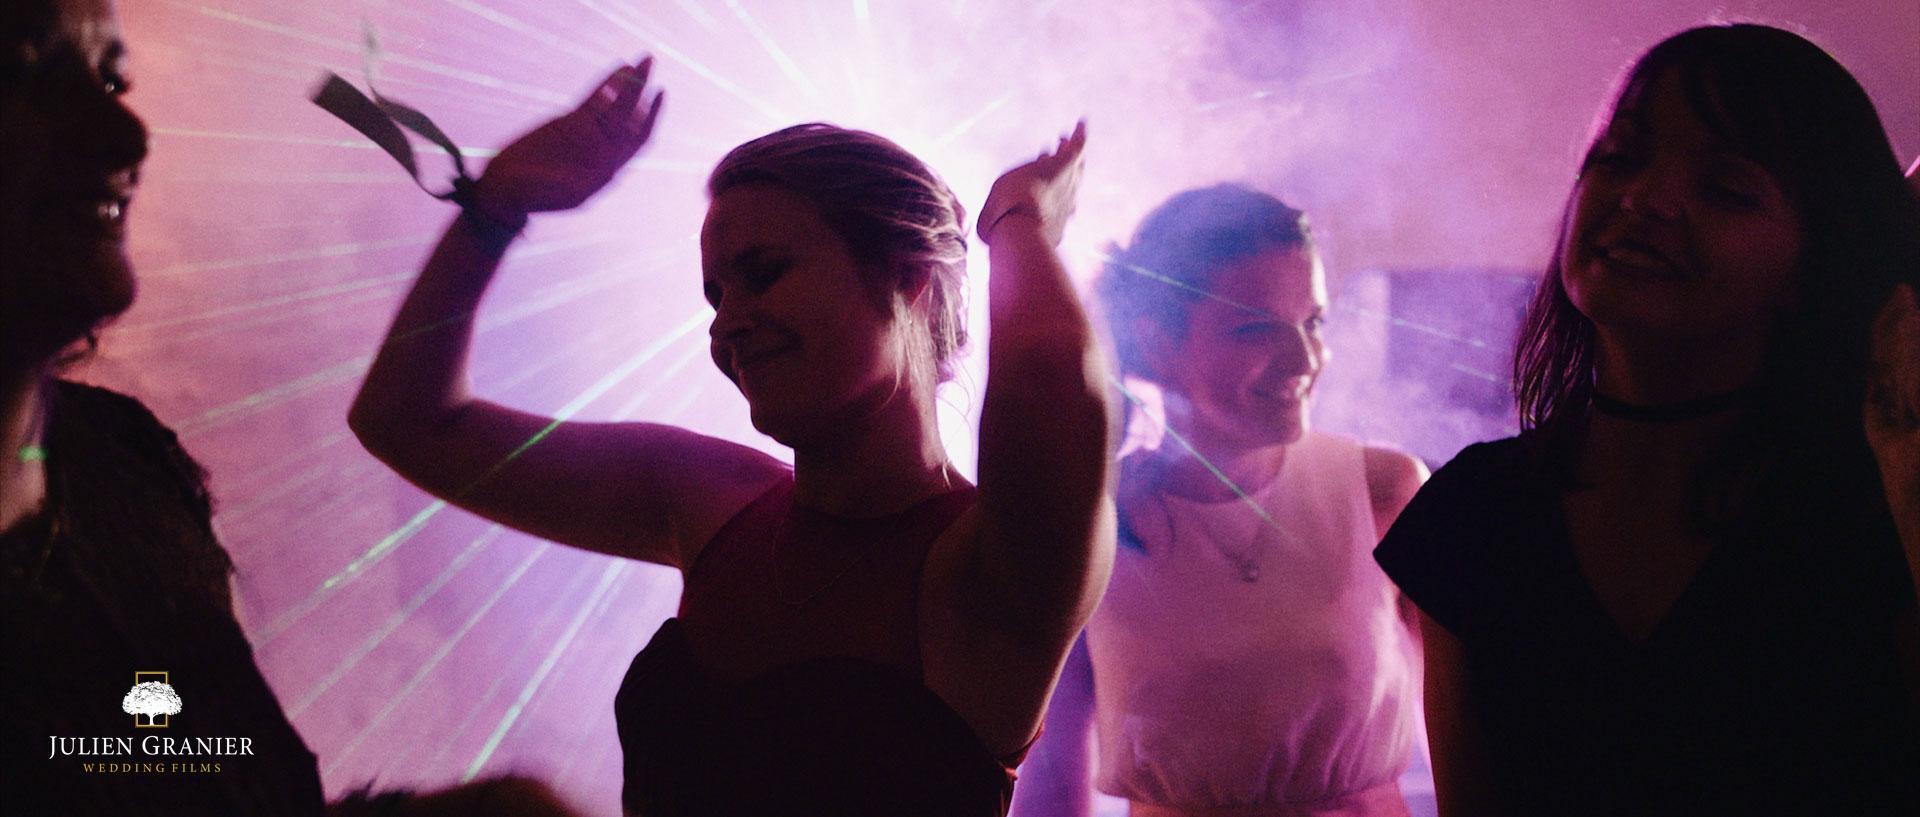 Melissa-&-Julien-Trailer.jpg